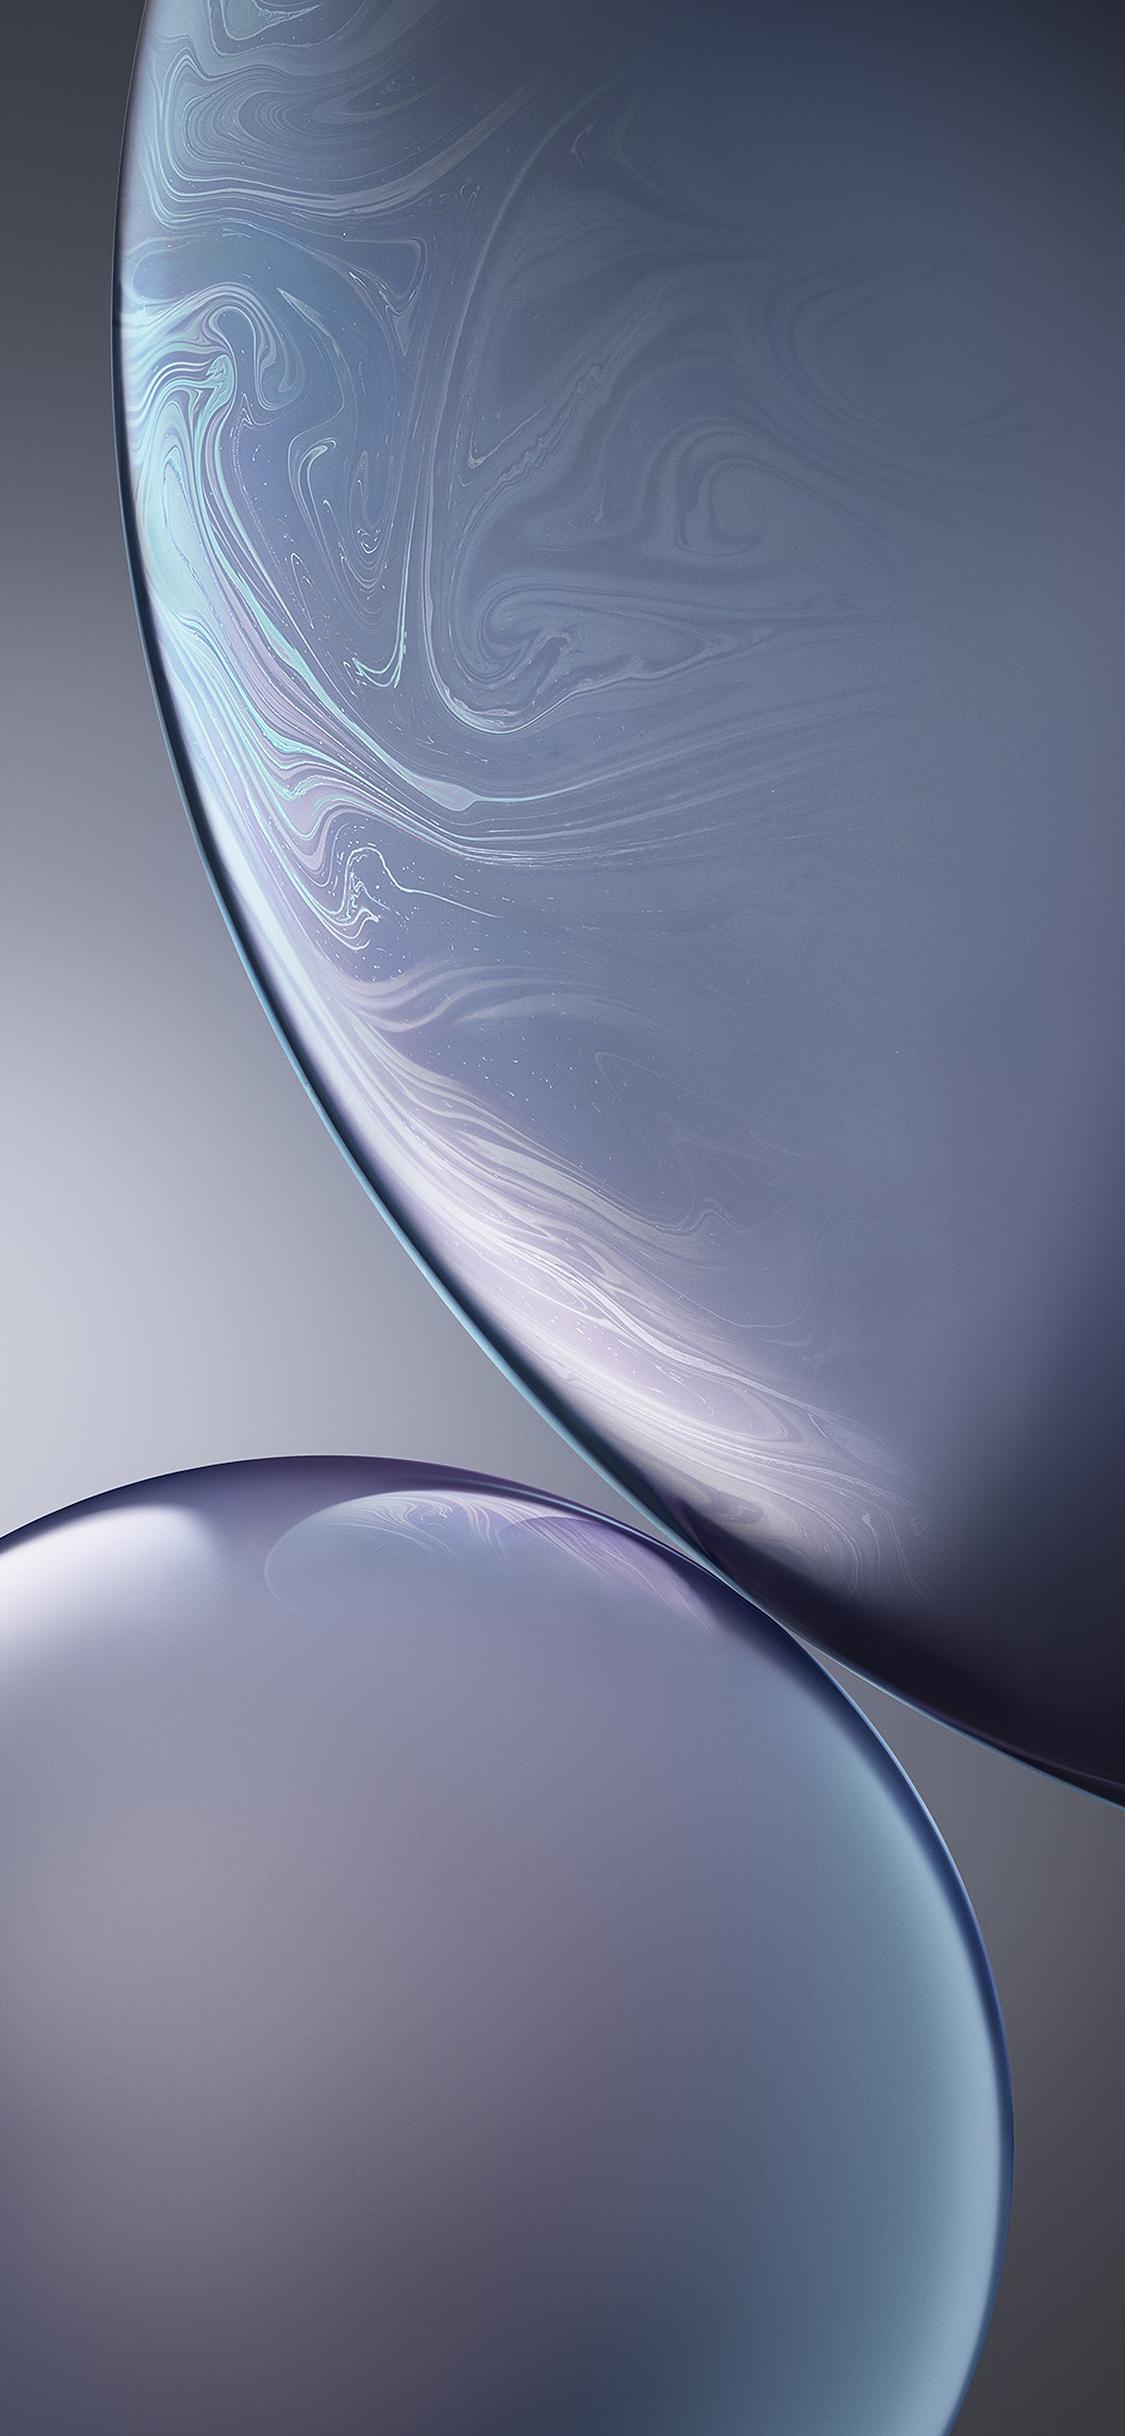 Epingle Par Nas Sur Lockscreen En 2020 Fond D Ecran Iphone Apple Fond Ecran Iphone Fond Ecran